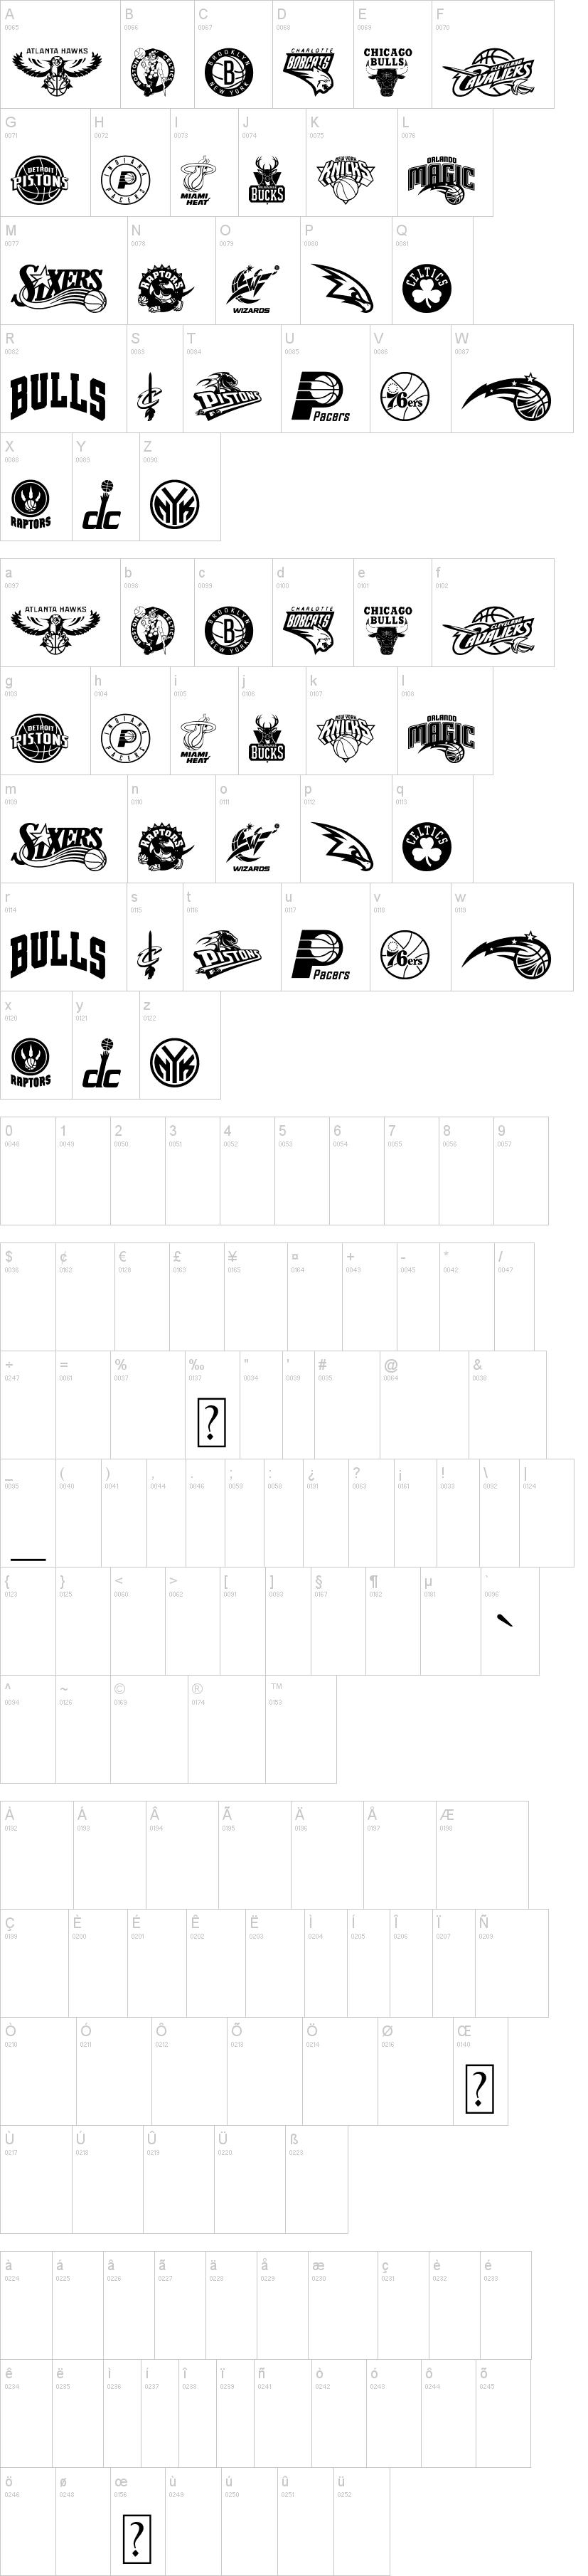 Black Mamba Vol.1 Brush Font Black mamba, Types of lettering